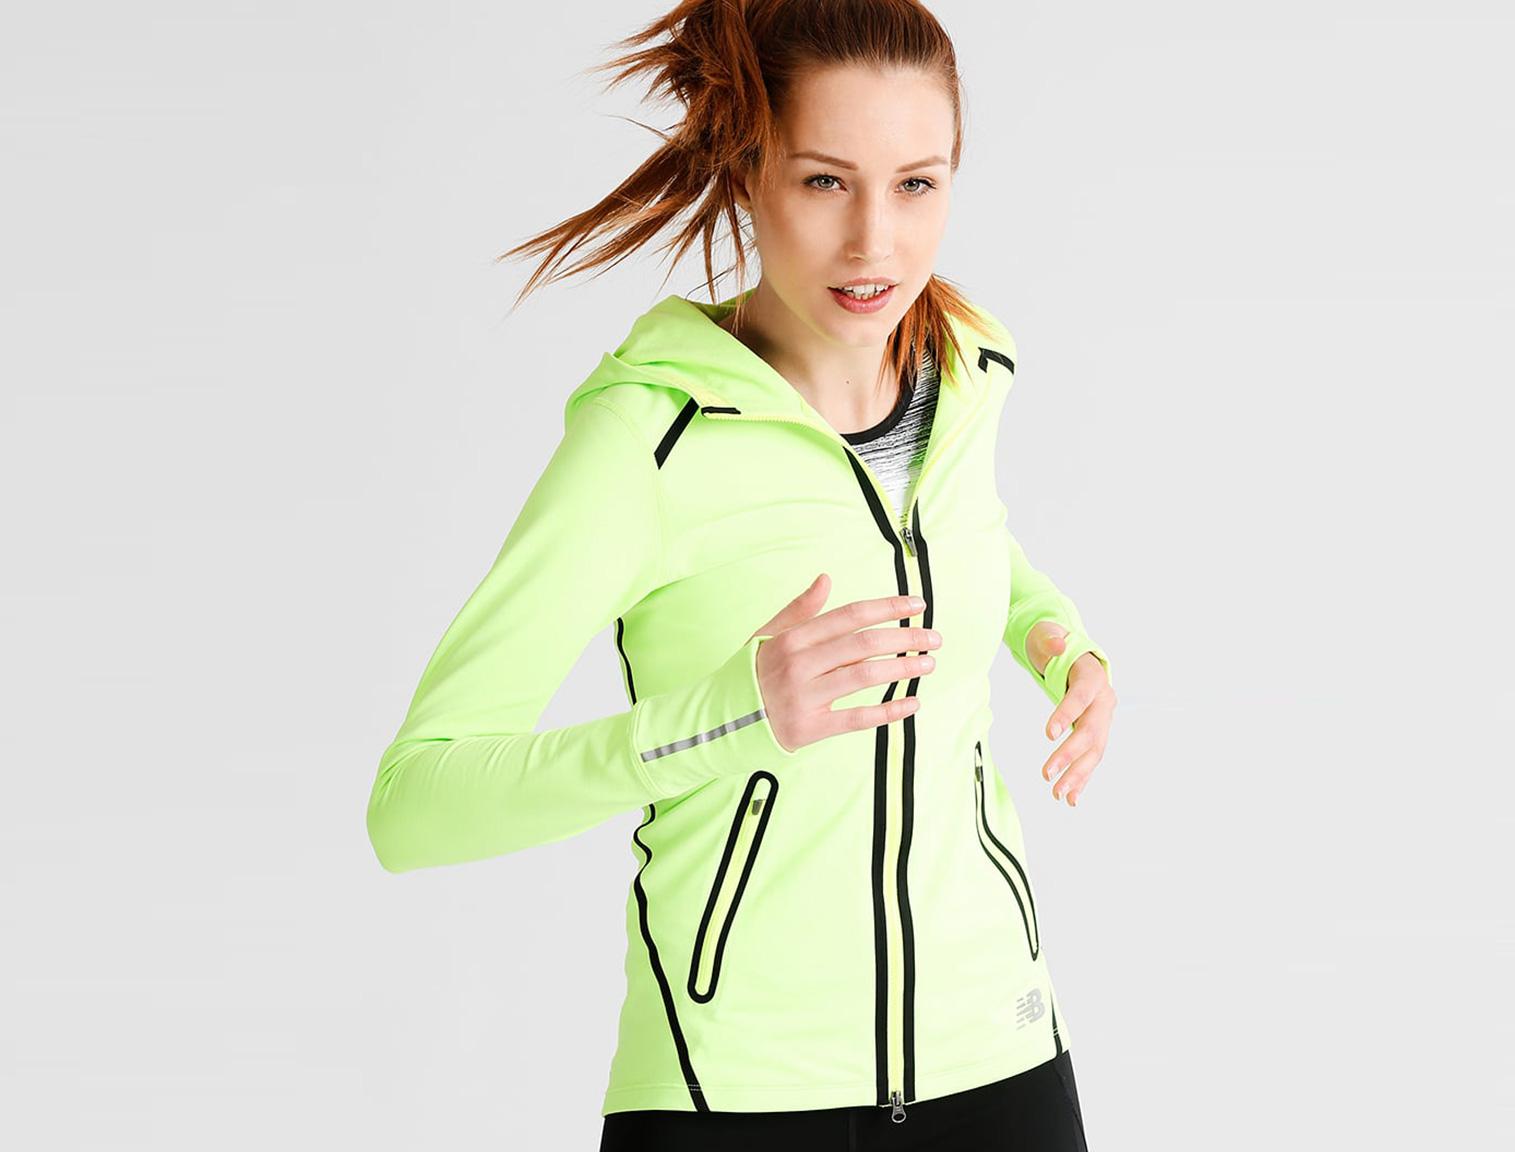 Mujer con con chaqueta running amarilla